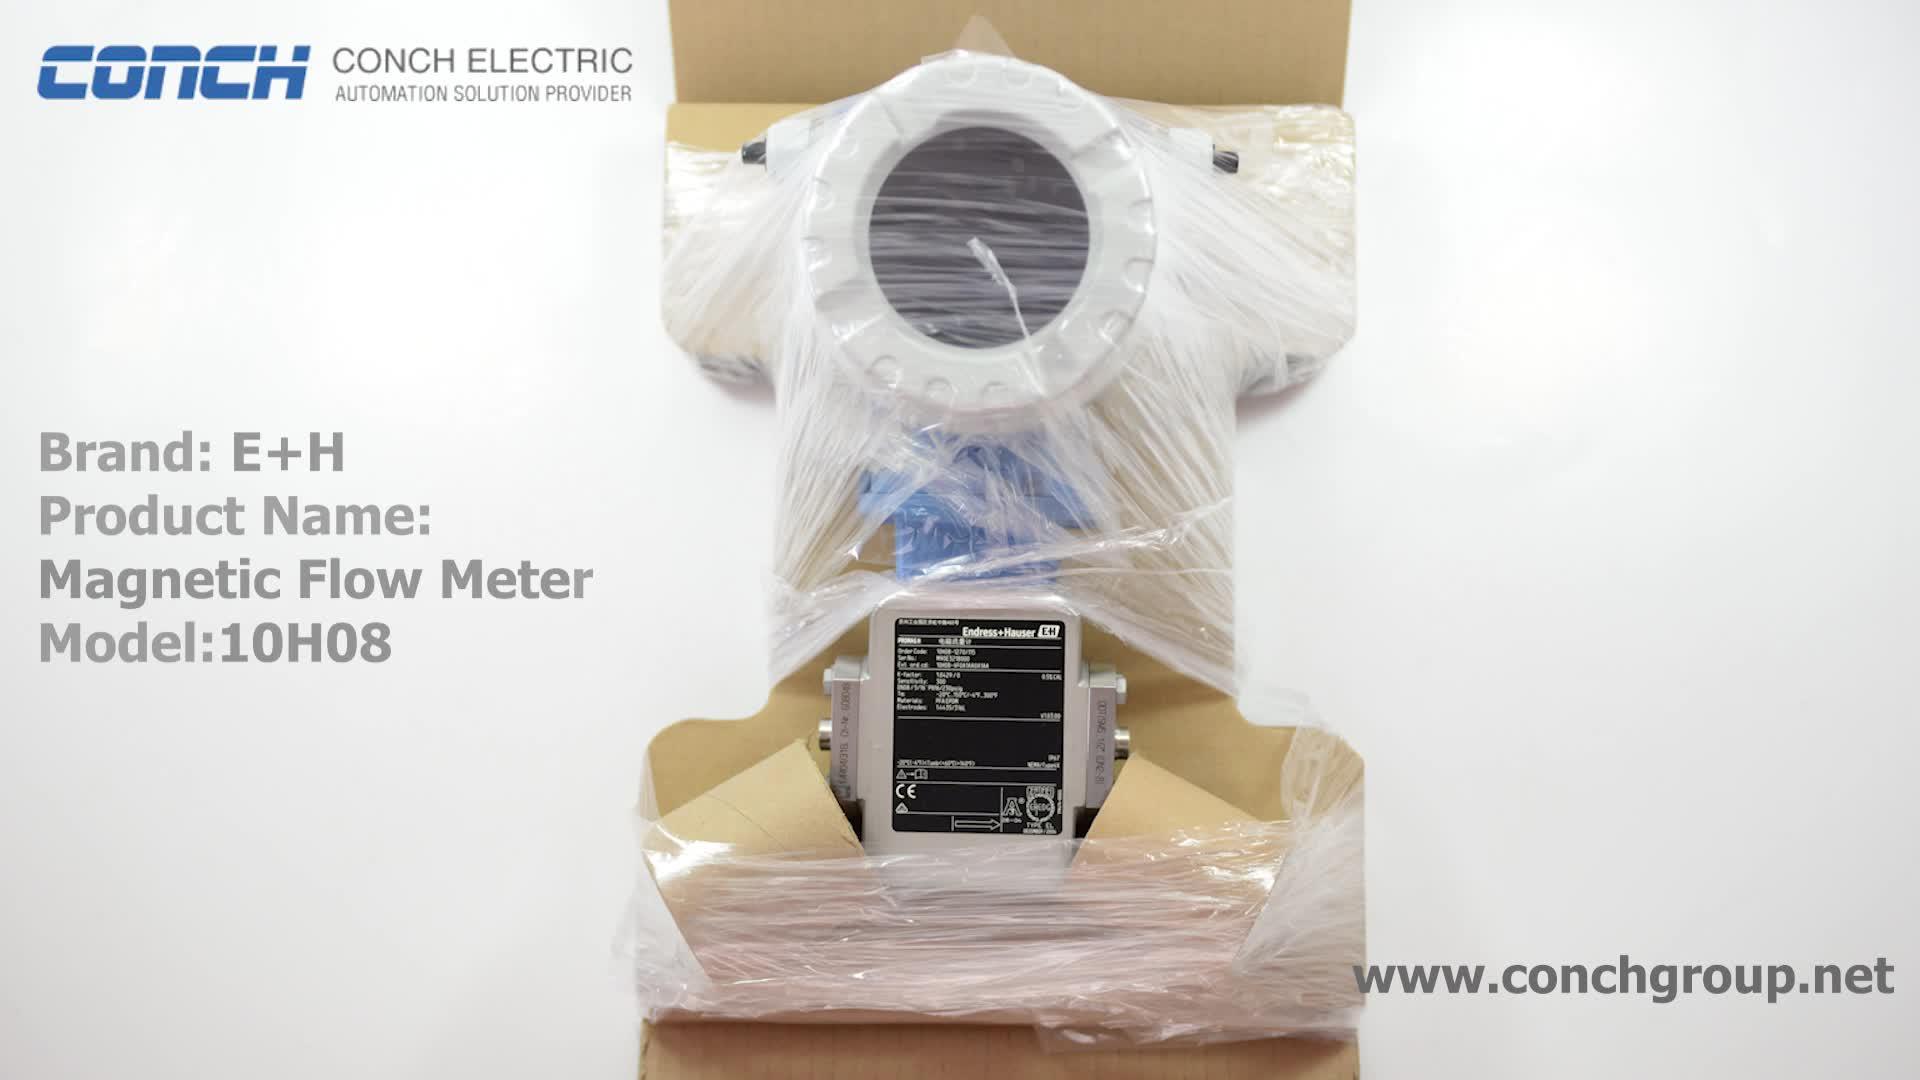 E + H Proline Promass P 100 Coriolis flow meter